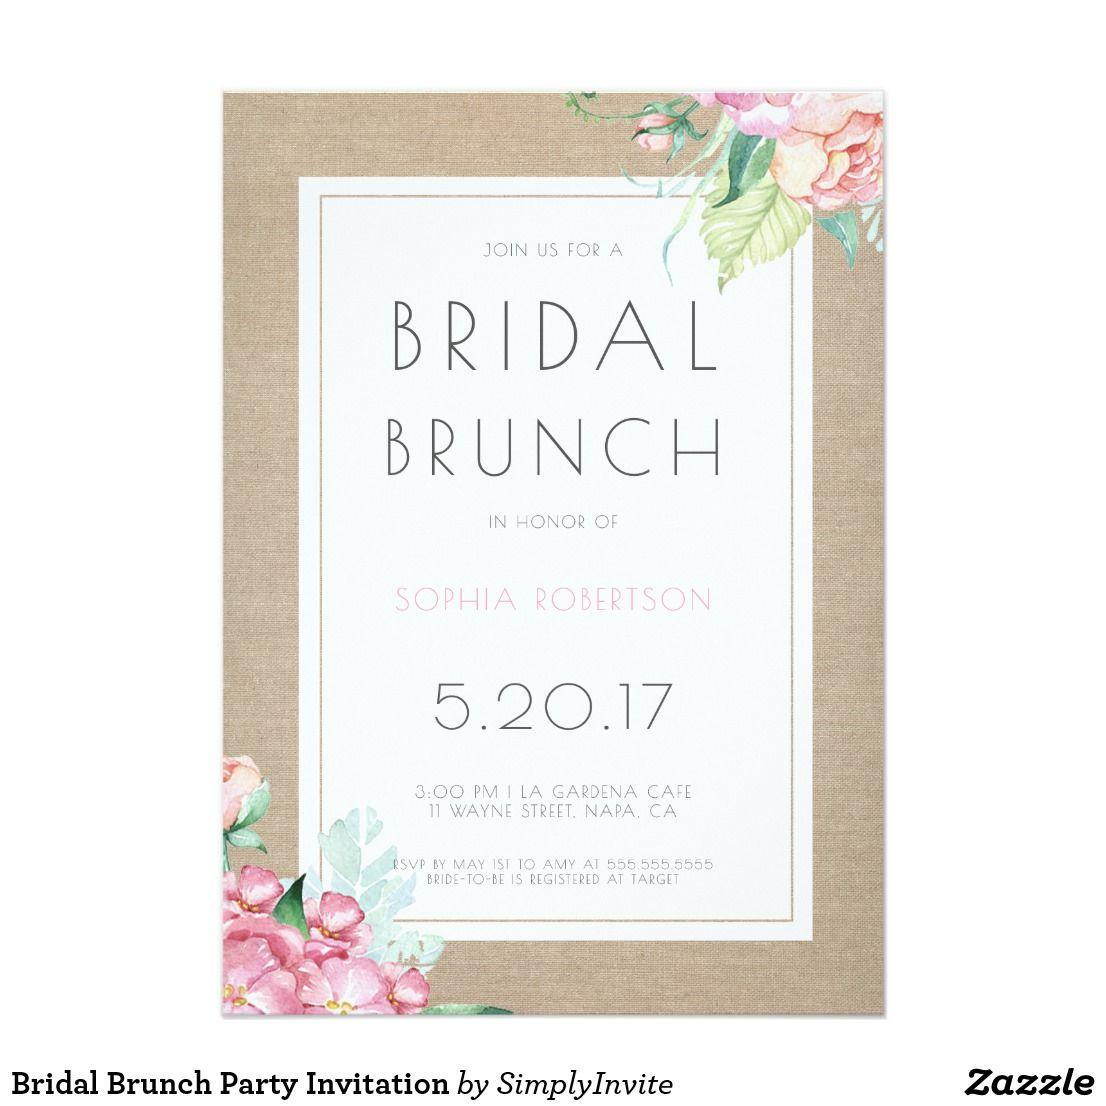 Bridal Brunch Party Invitation | Brunch party